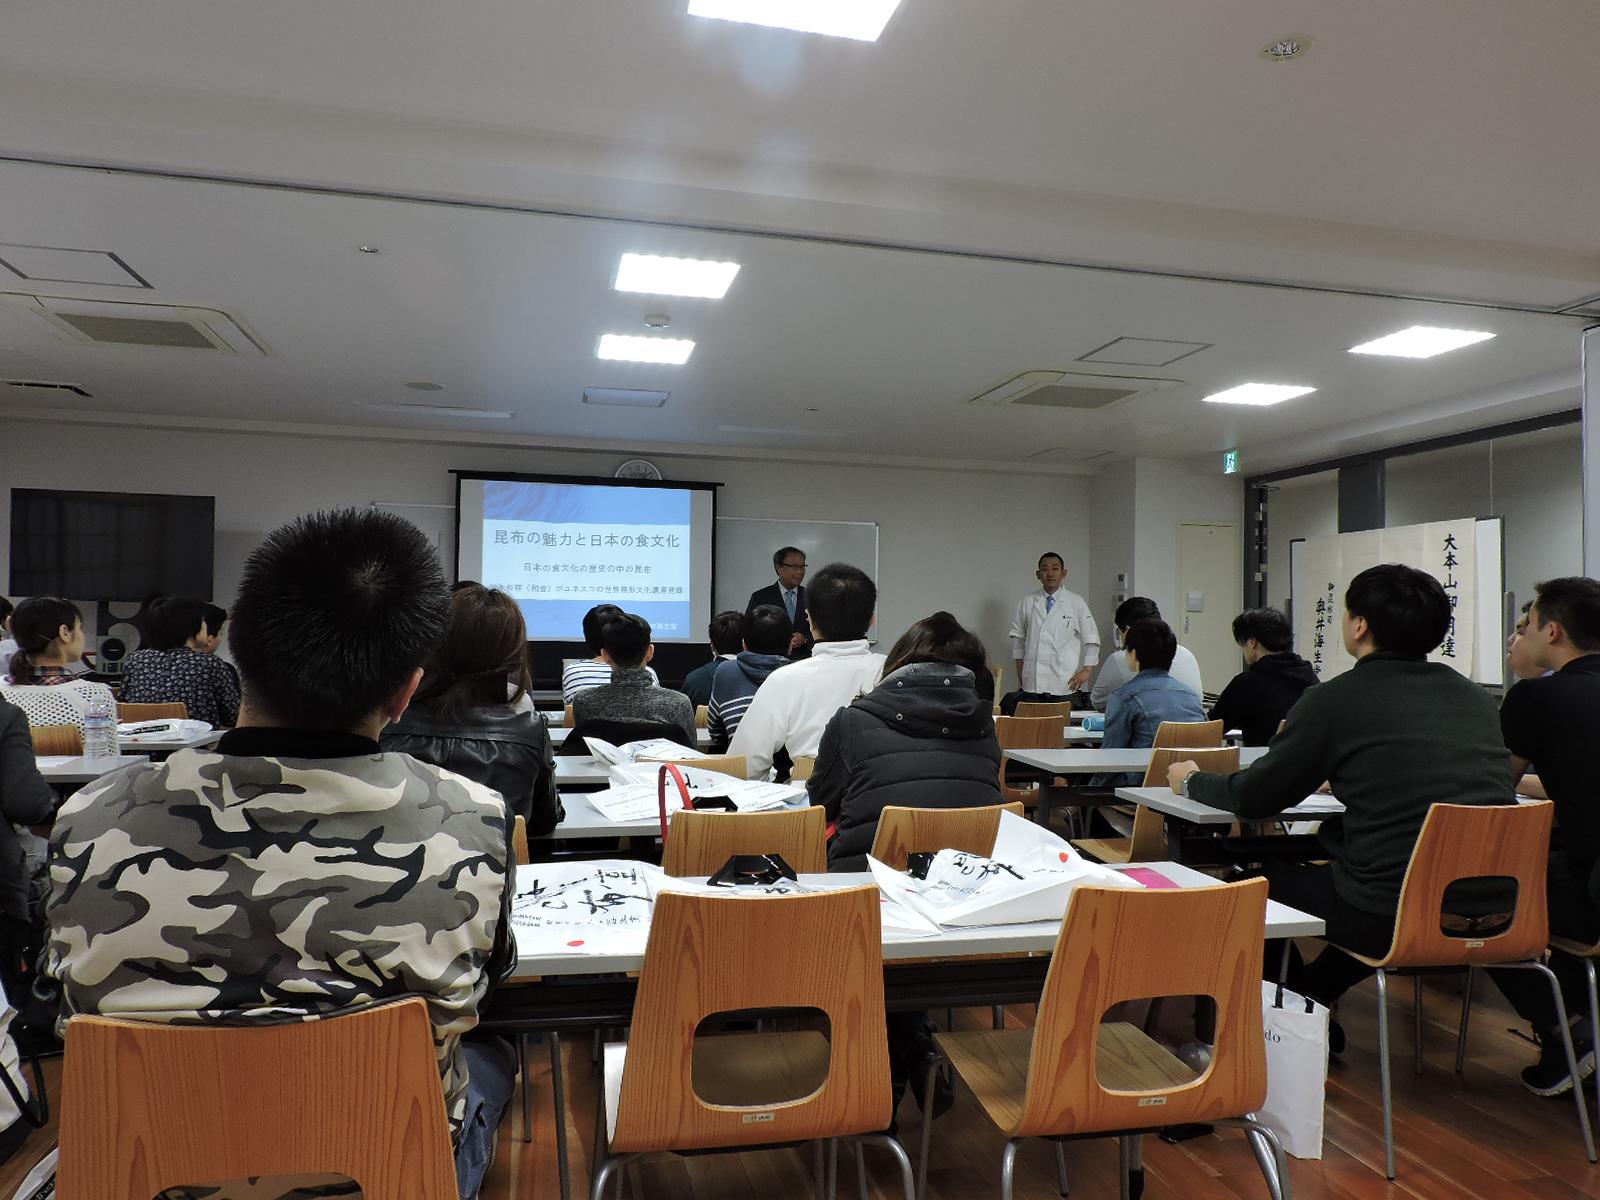 『昆布の魅力と日本食文化』 於:東京すし和食調理専門学校